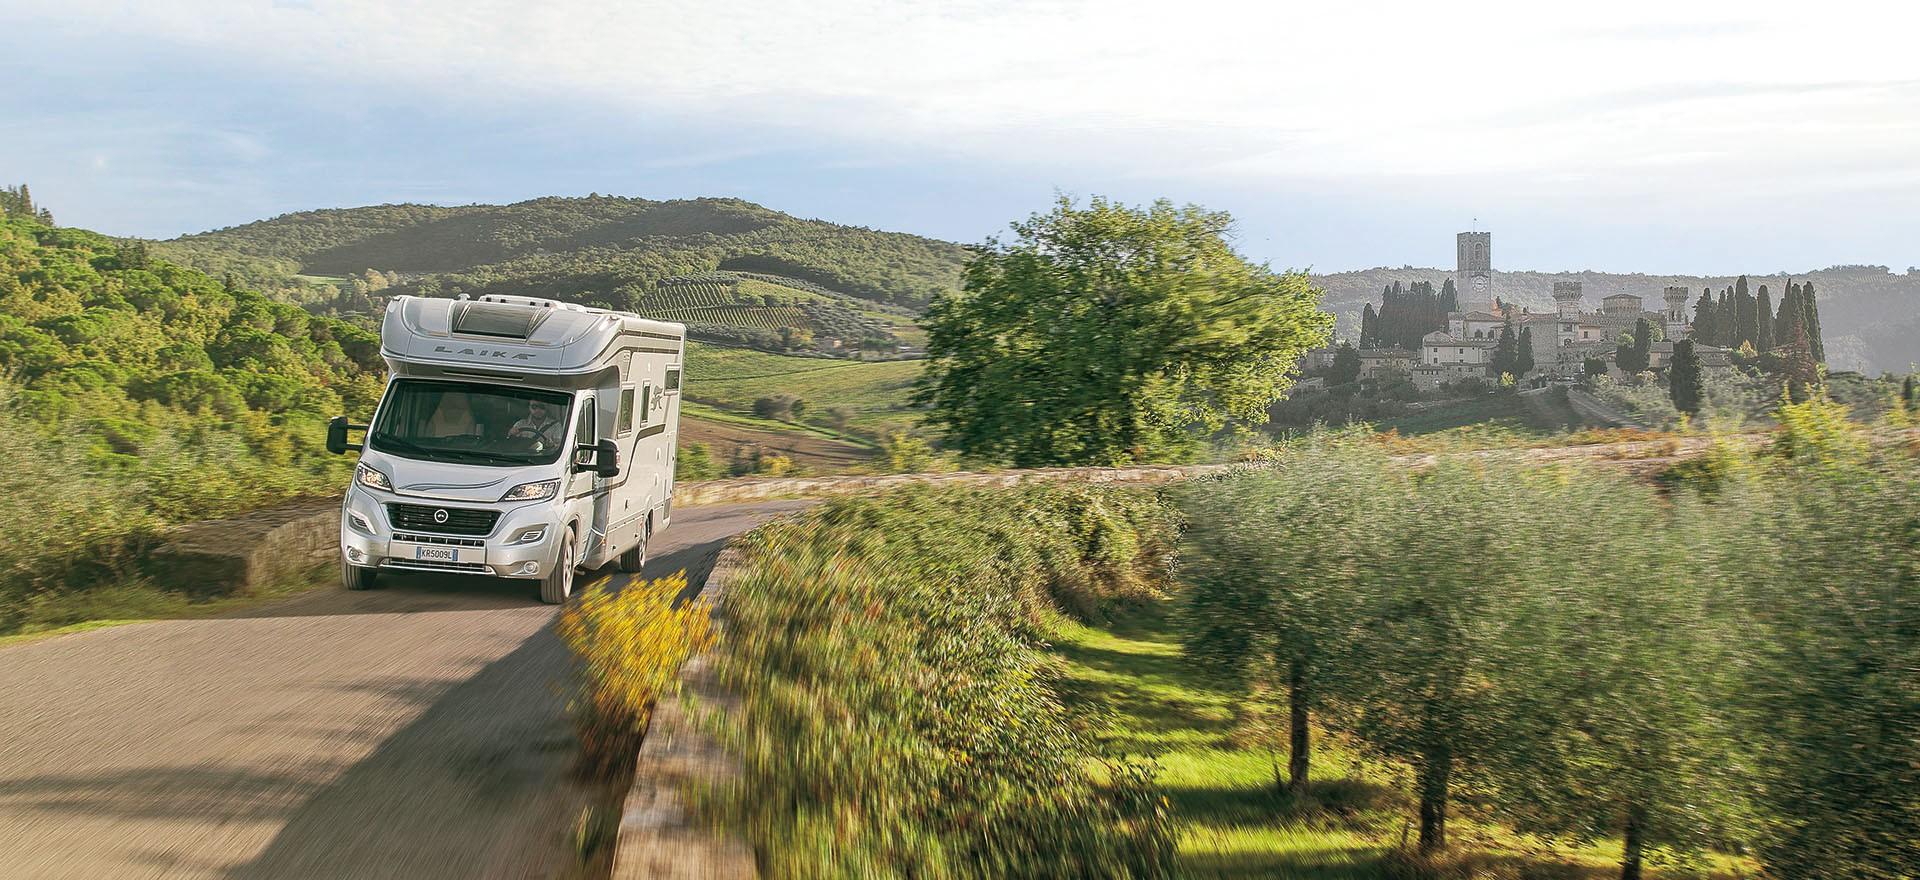 Wohnmobil in der Toskana